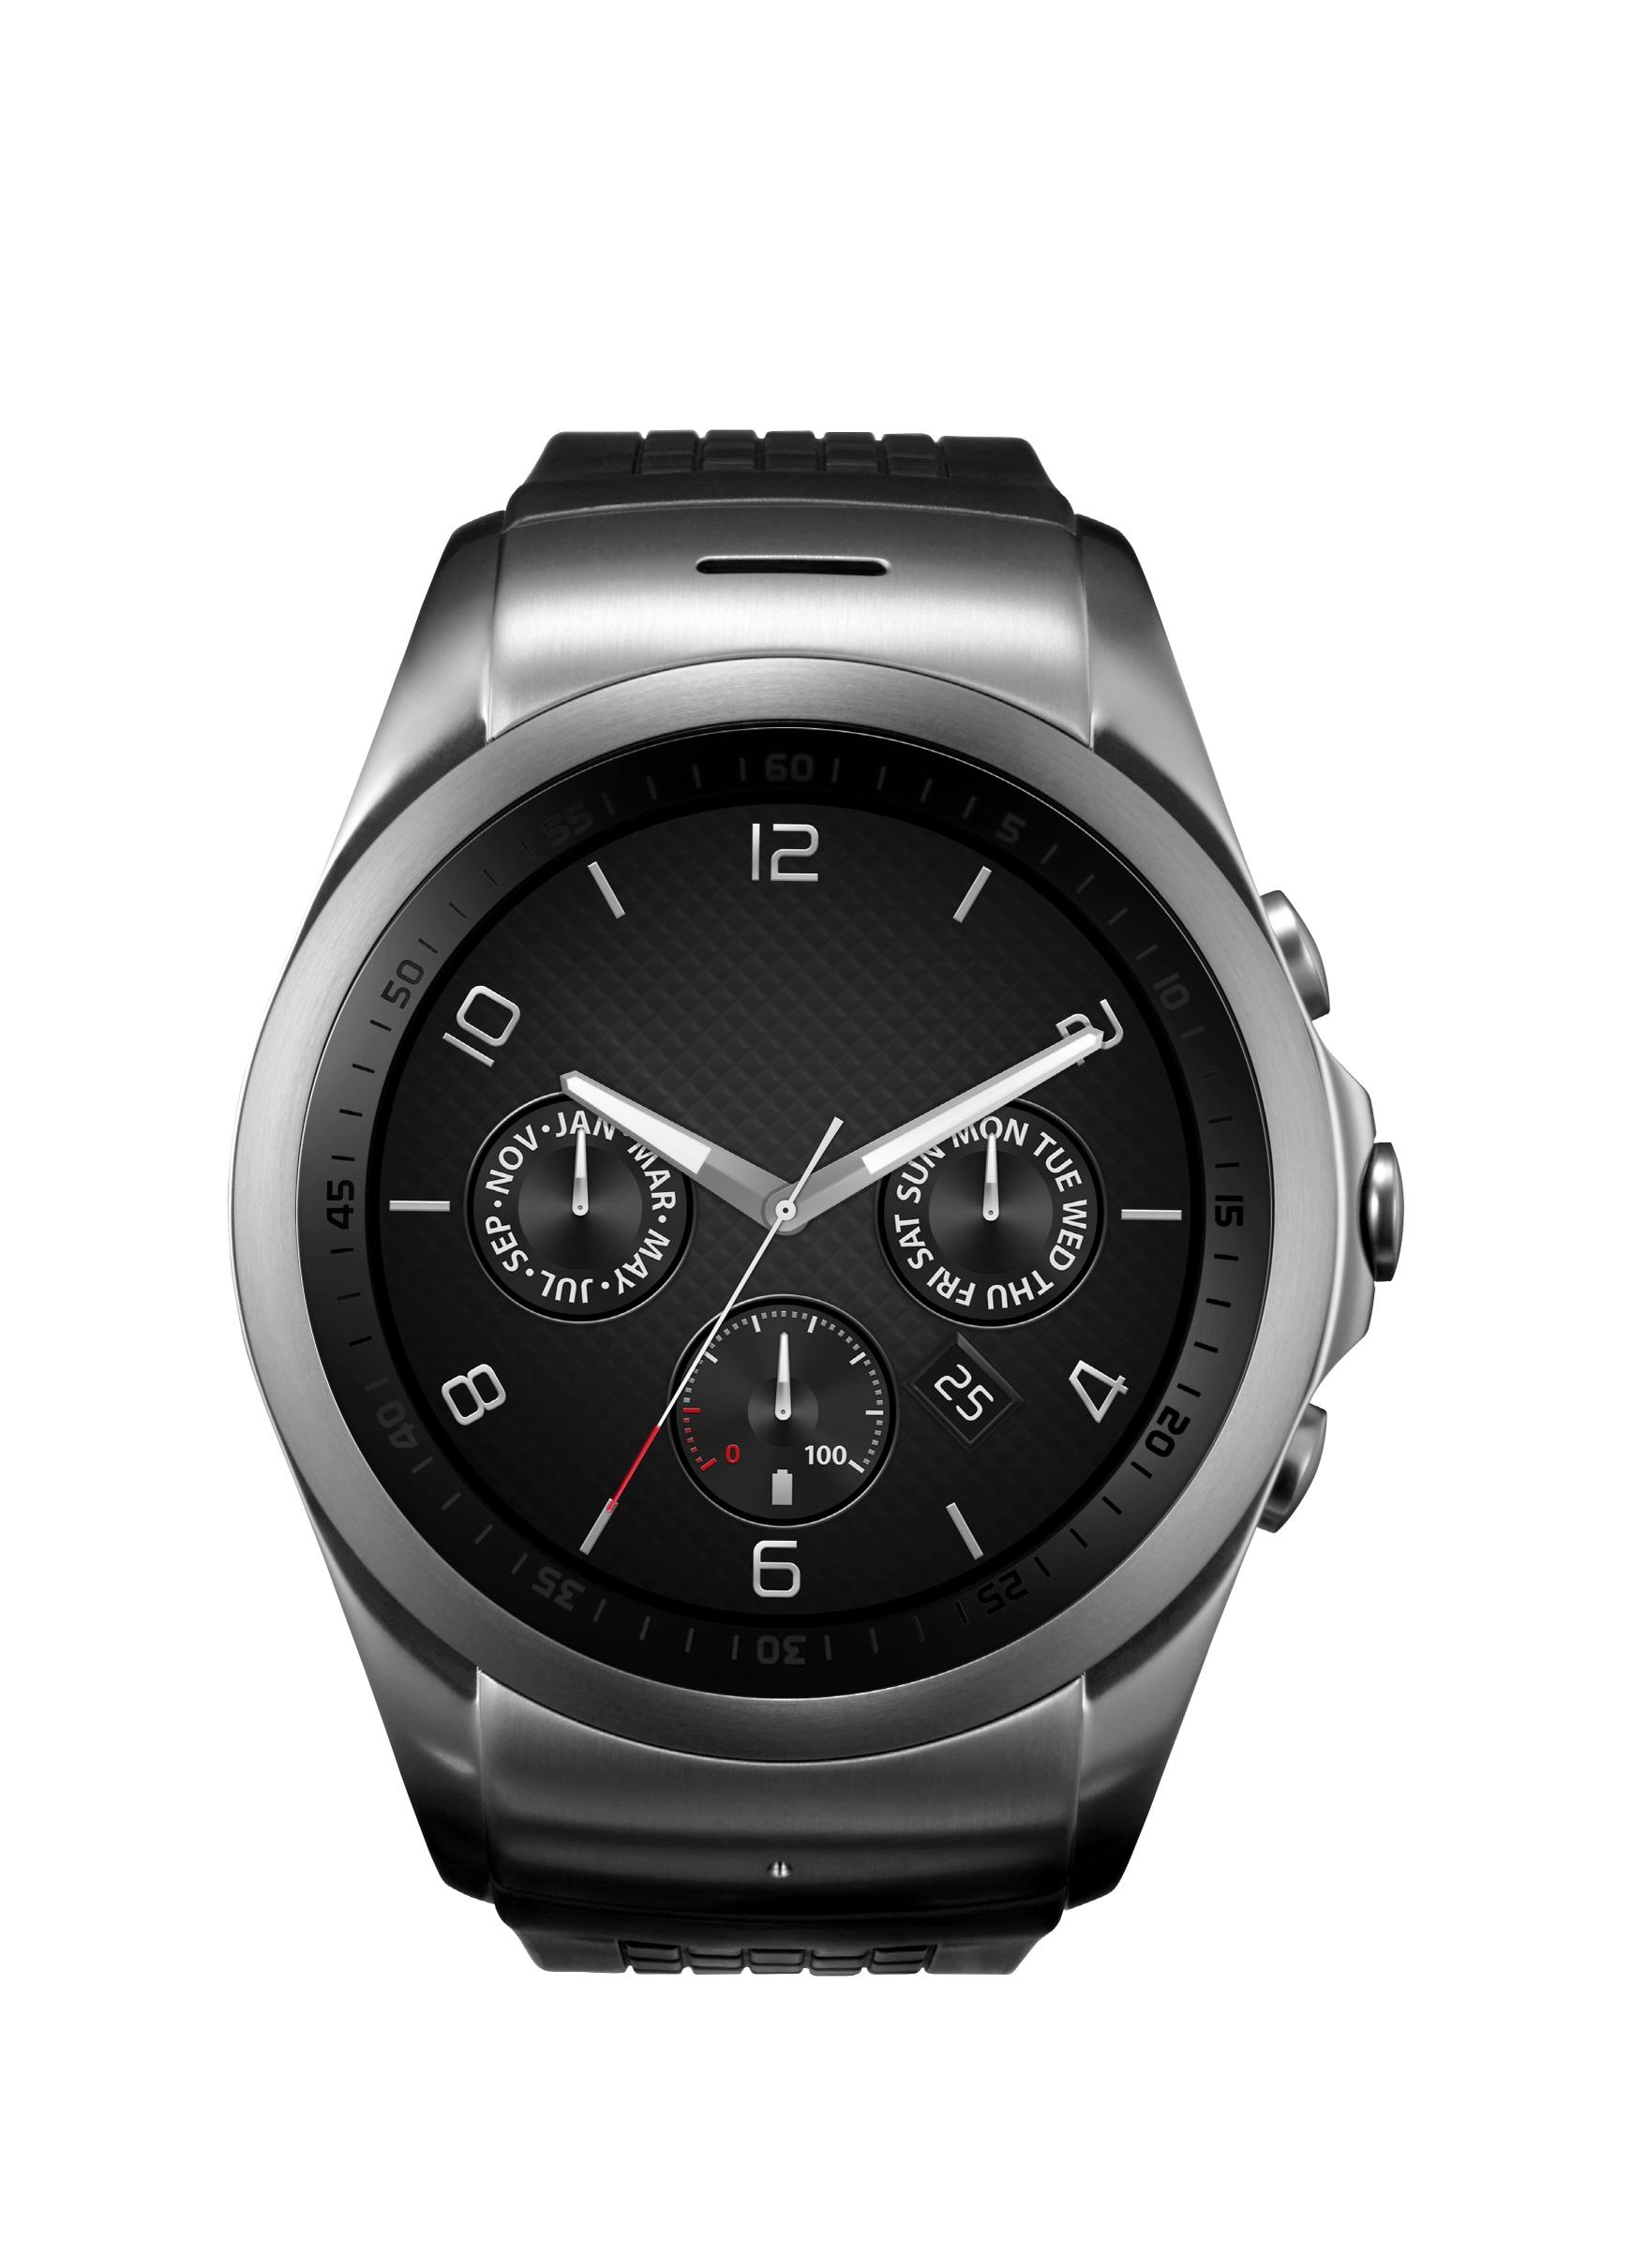 LG_Watch_Urbane_LTE_1